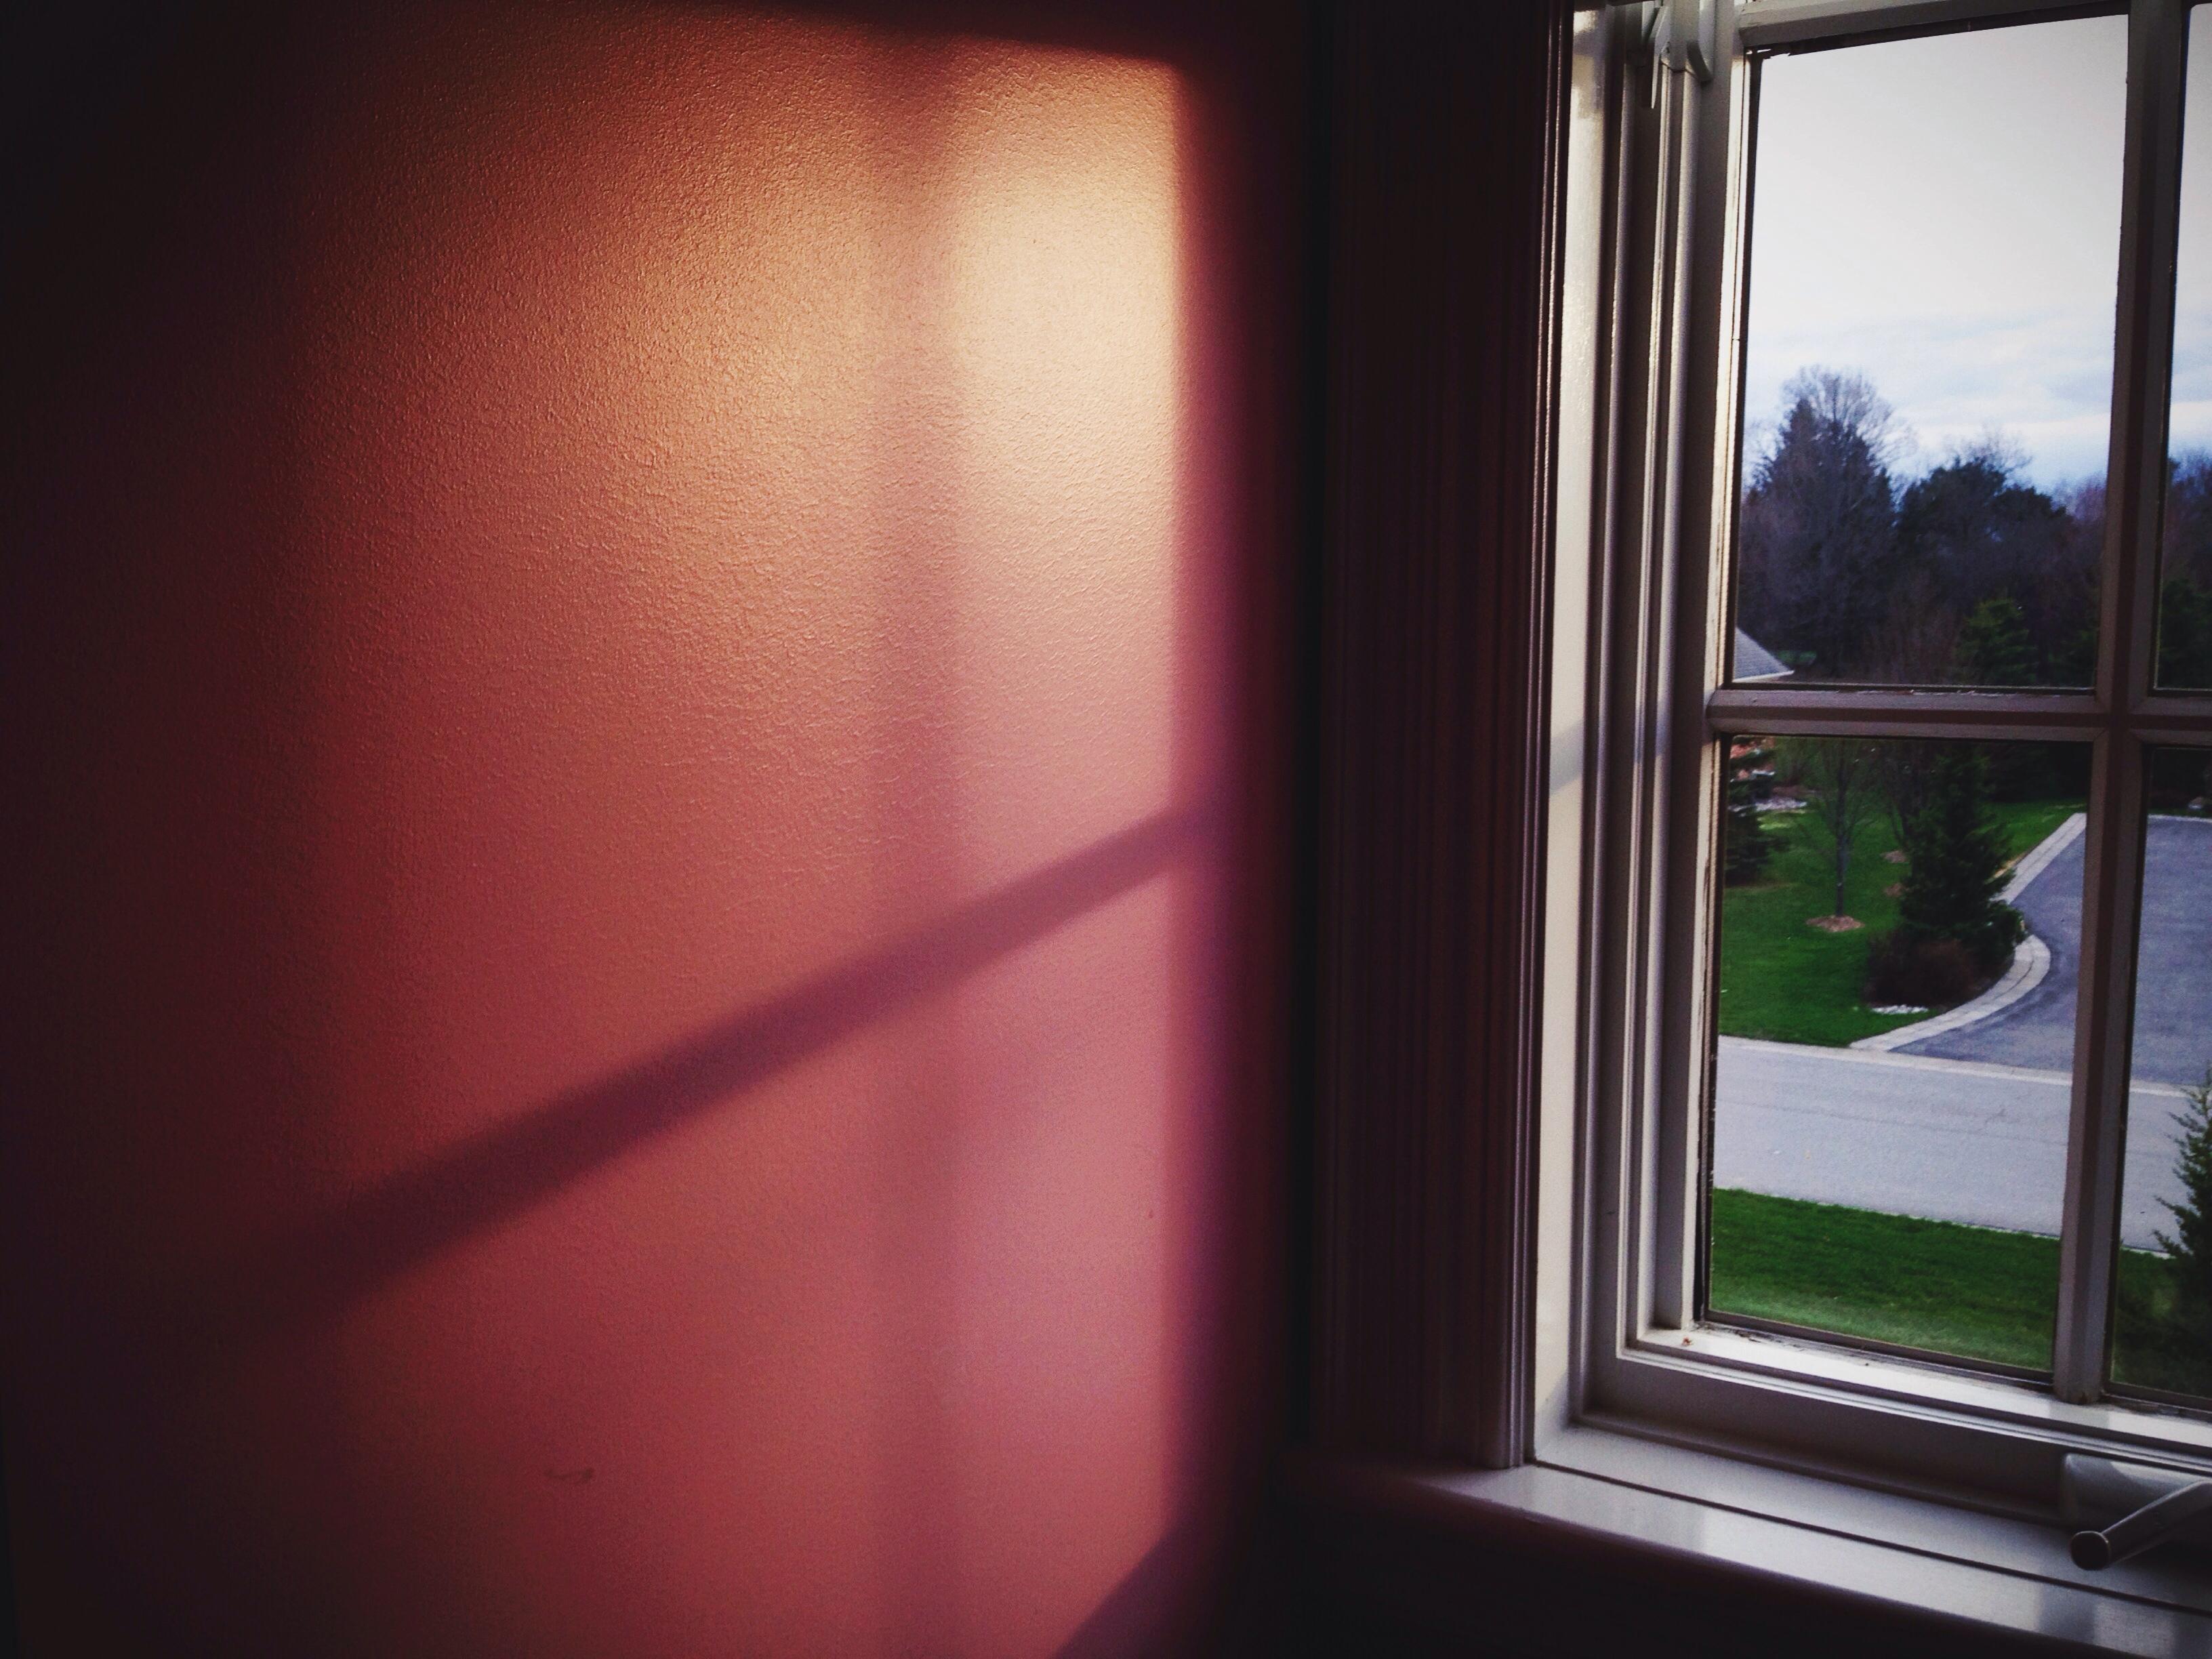 Unduh 7000+ Wallpaper Cantik Matahari HD Paling Keren